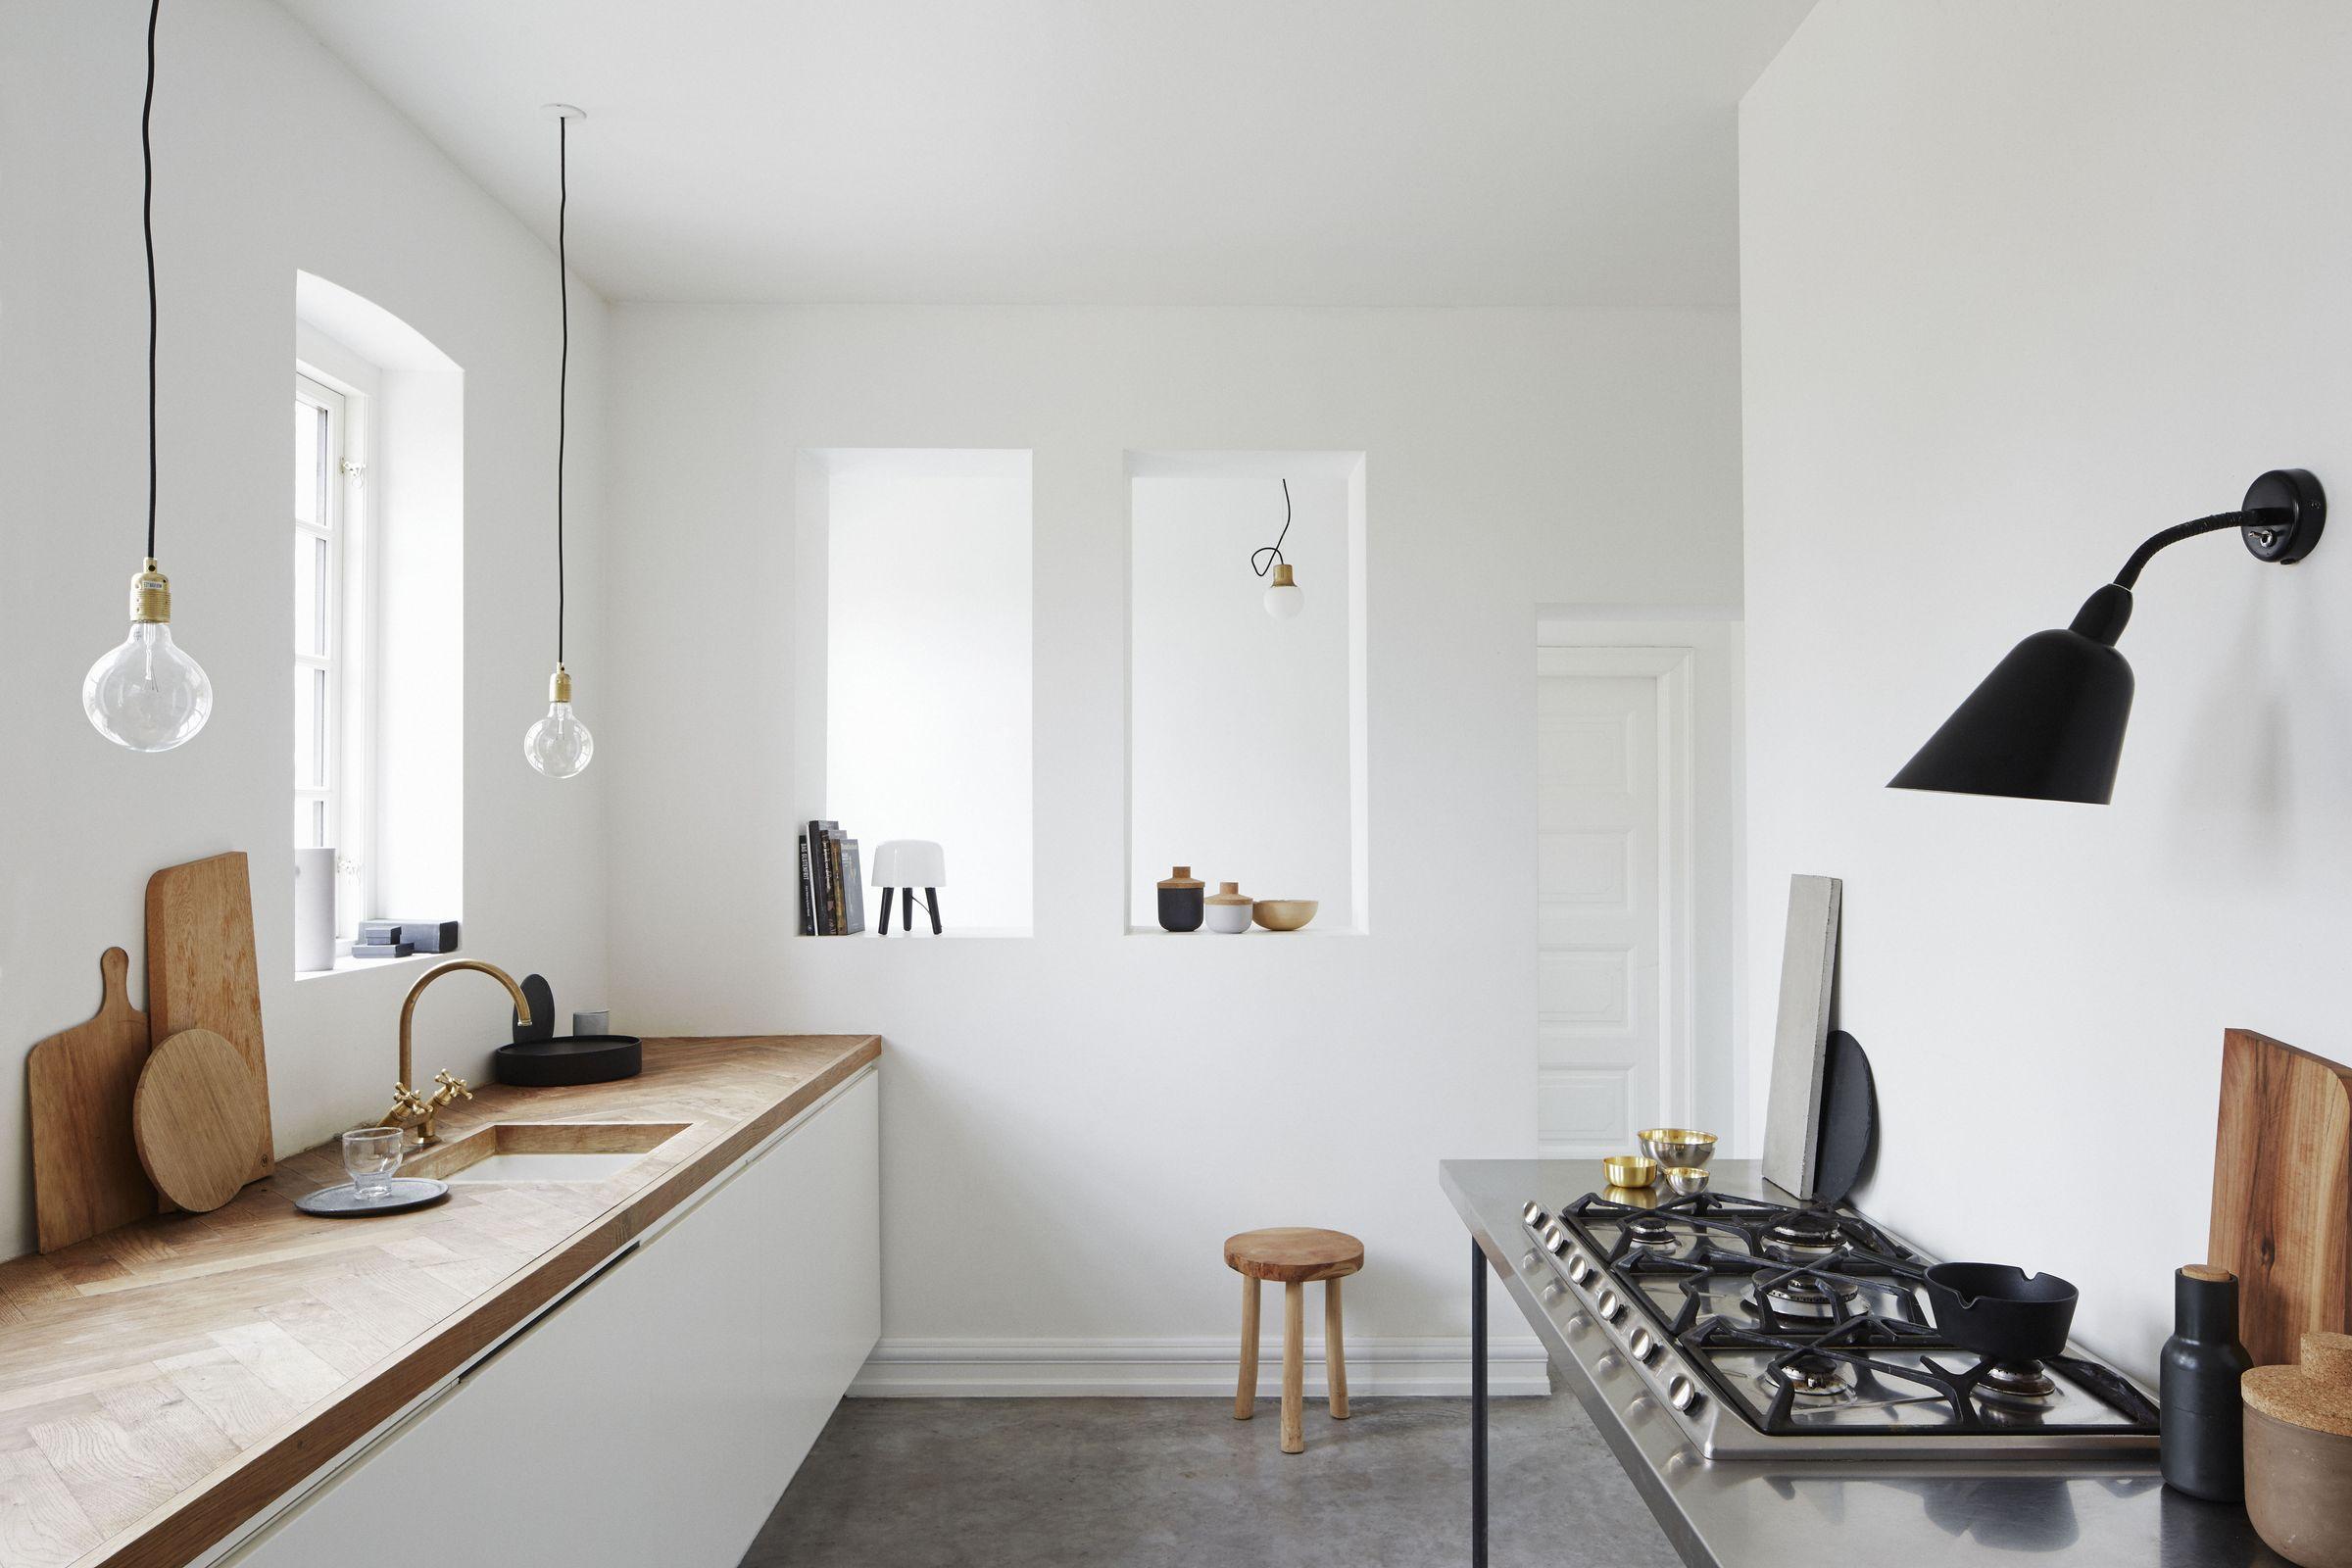 unfitted kitchen design. Studio Apartment  Unfitted KitchenKitchen Is Kinfolk The Last Lifestyle Magazine Interiors Kitchens And